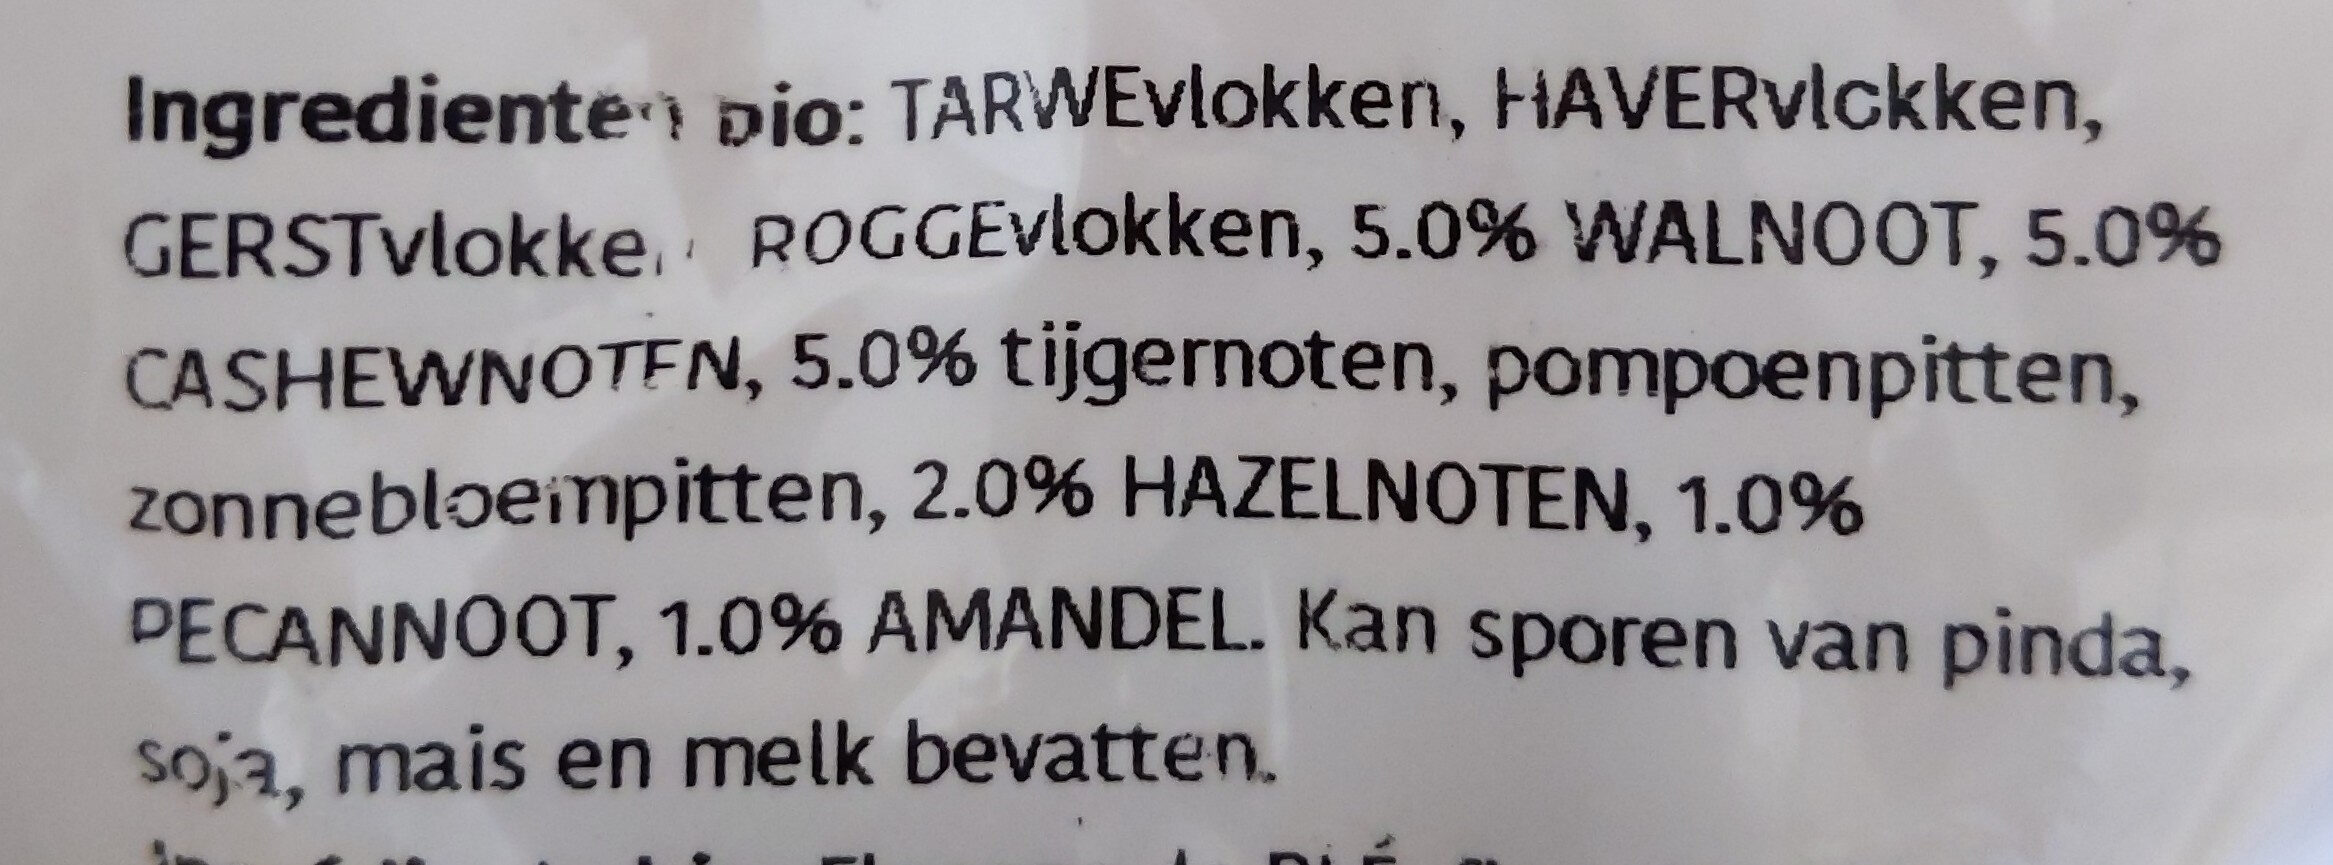 Muesli noix - Ingredients - nl